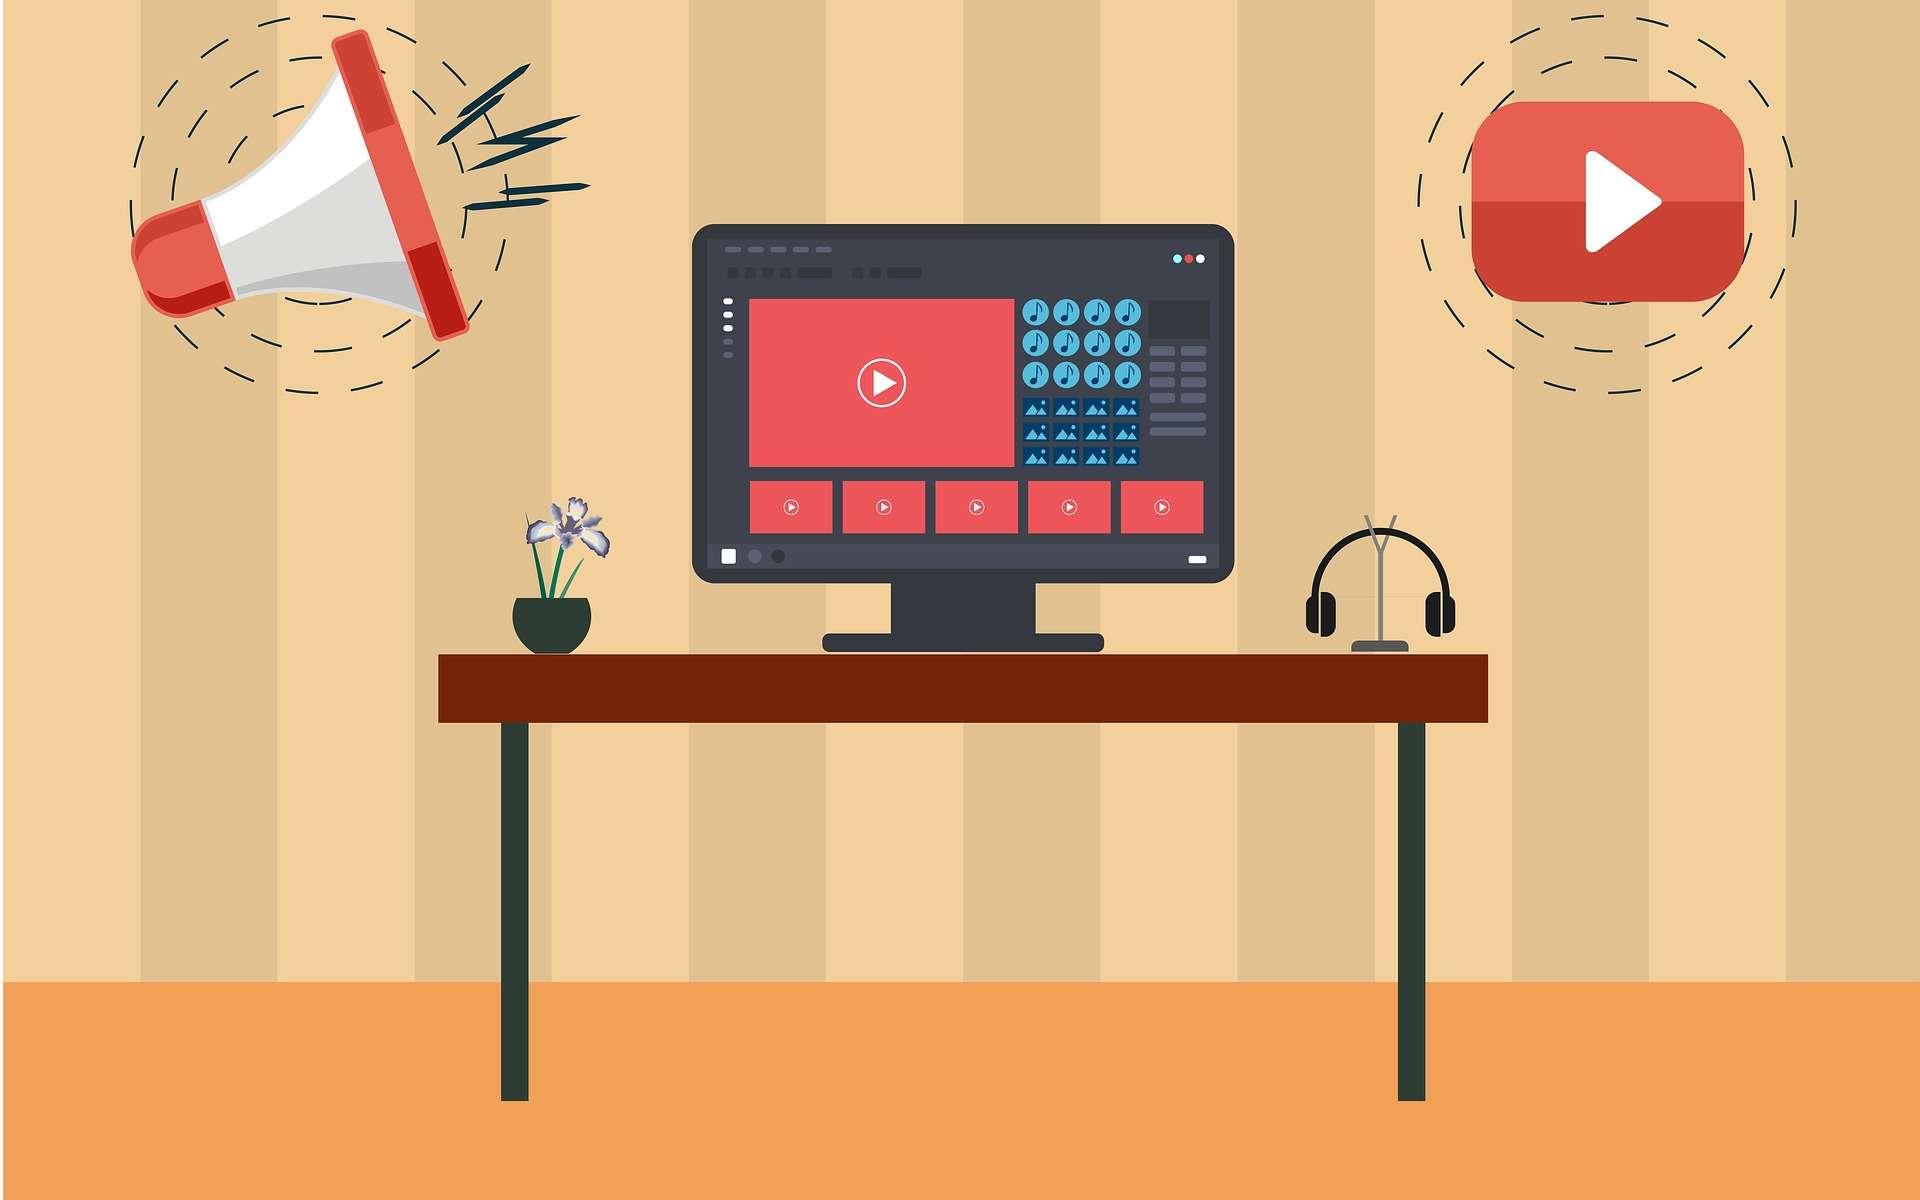 Créez des présentations vidéo avec DemoCreator. © kreatikar - pixabay.com